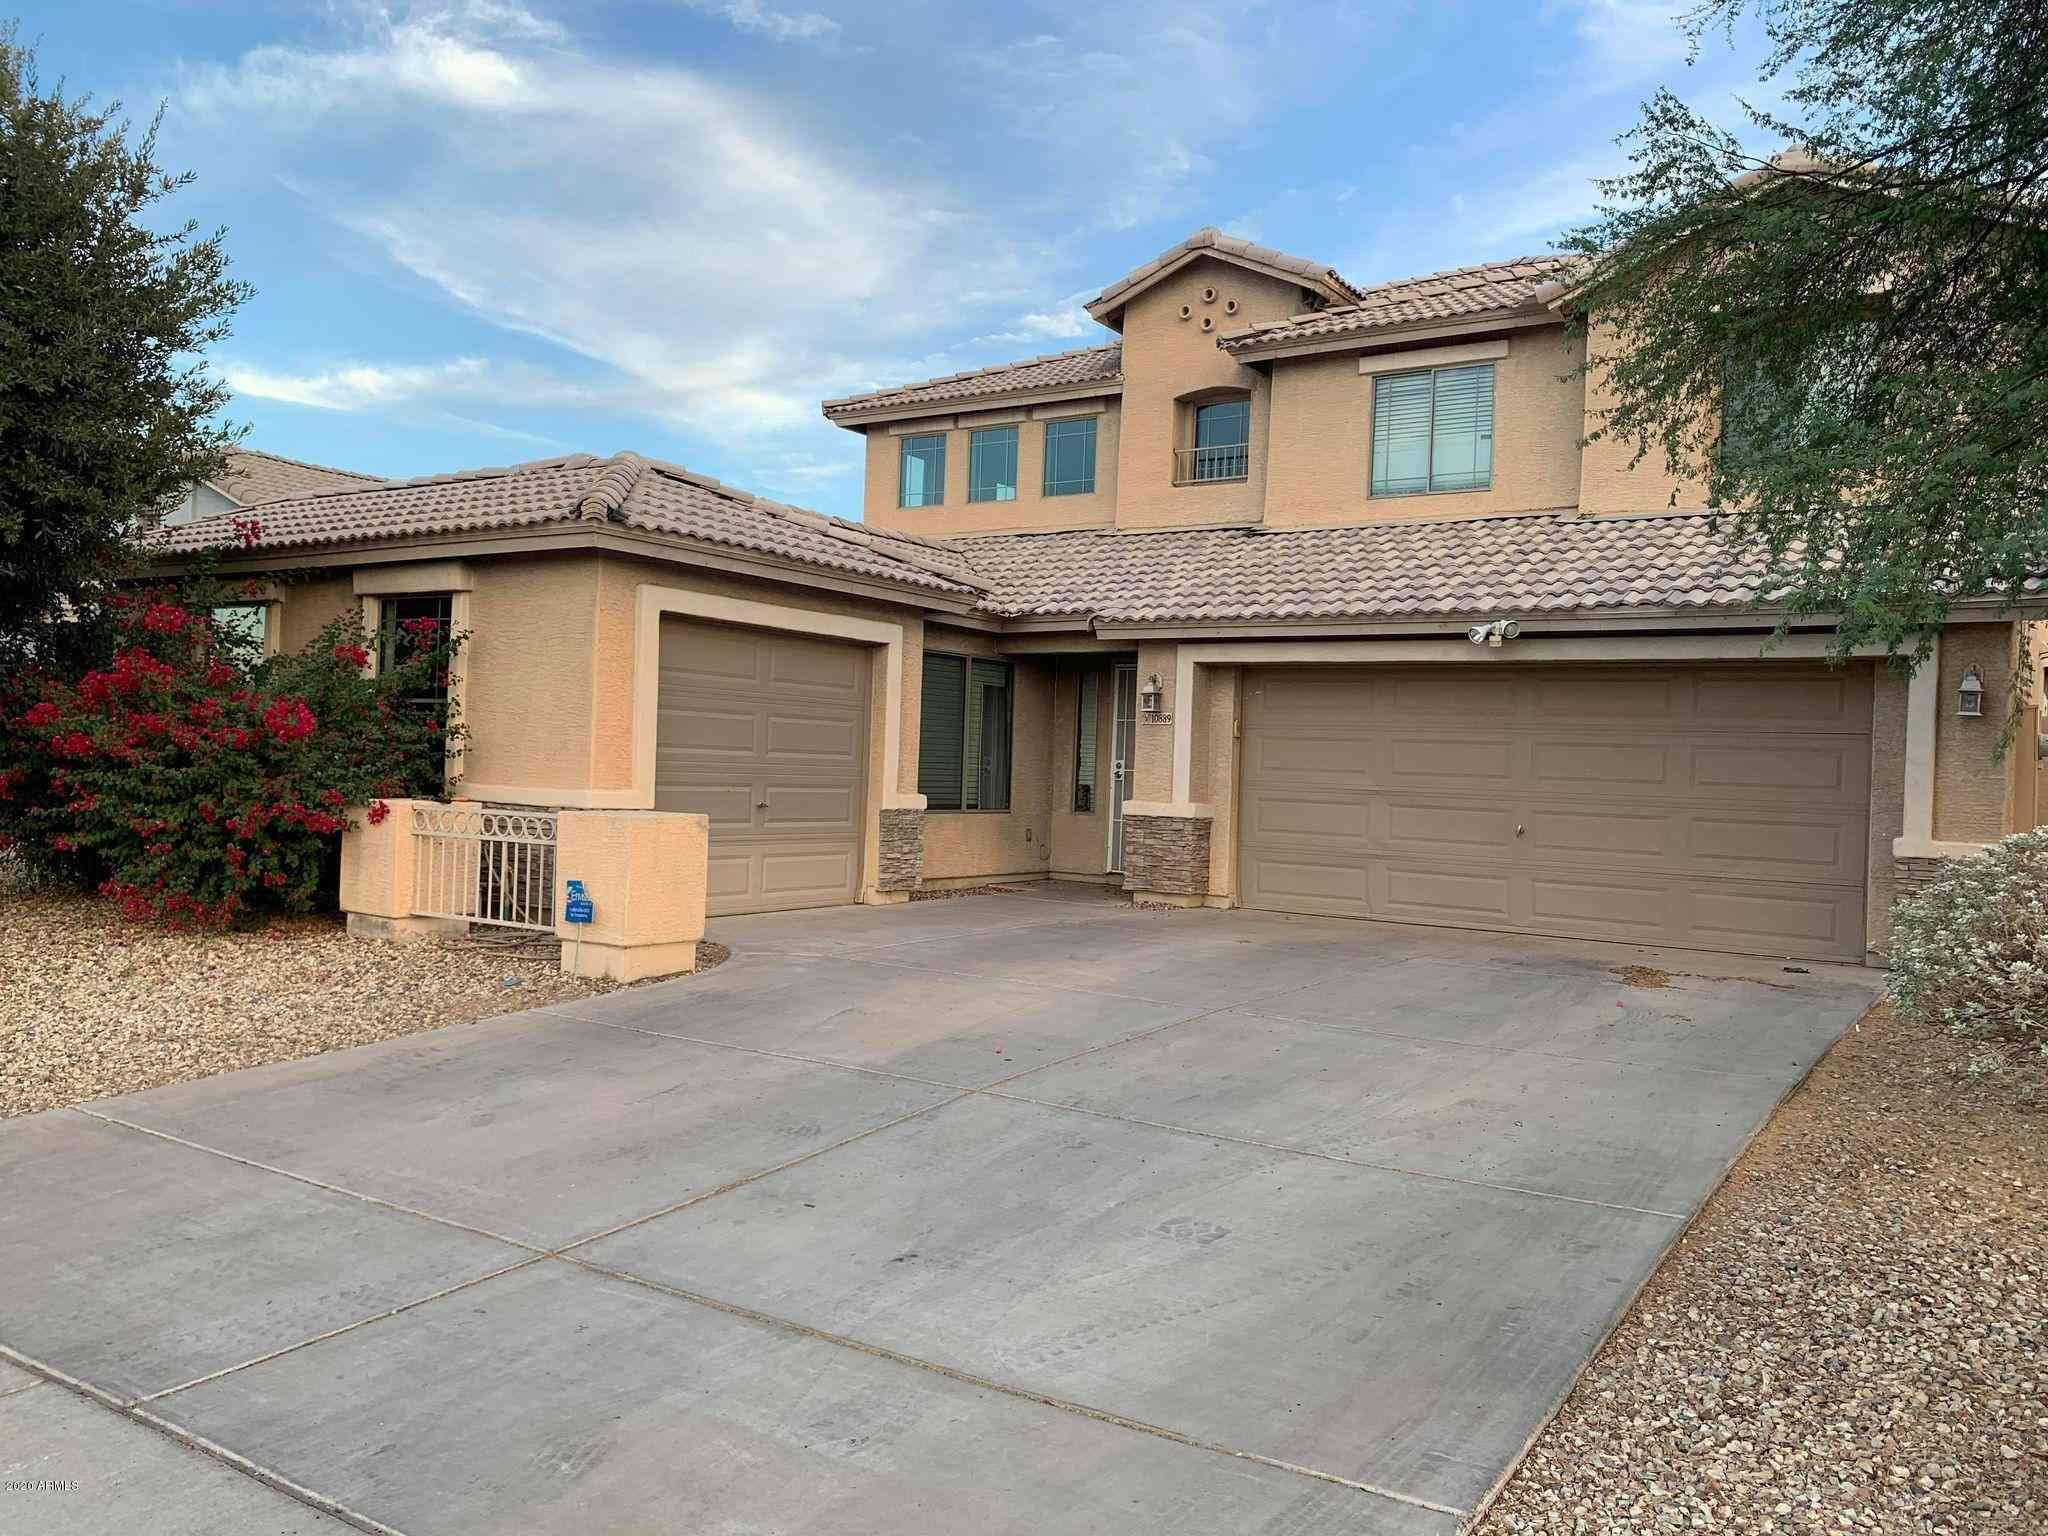 10889 W Locust Lane, Avondale, AZ, 85323,